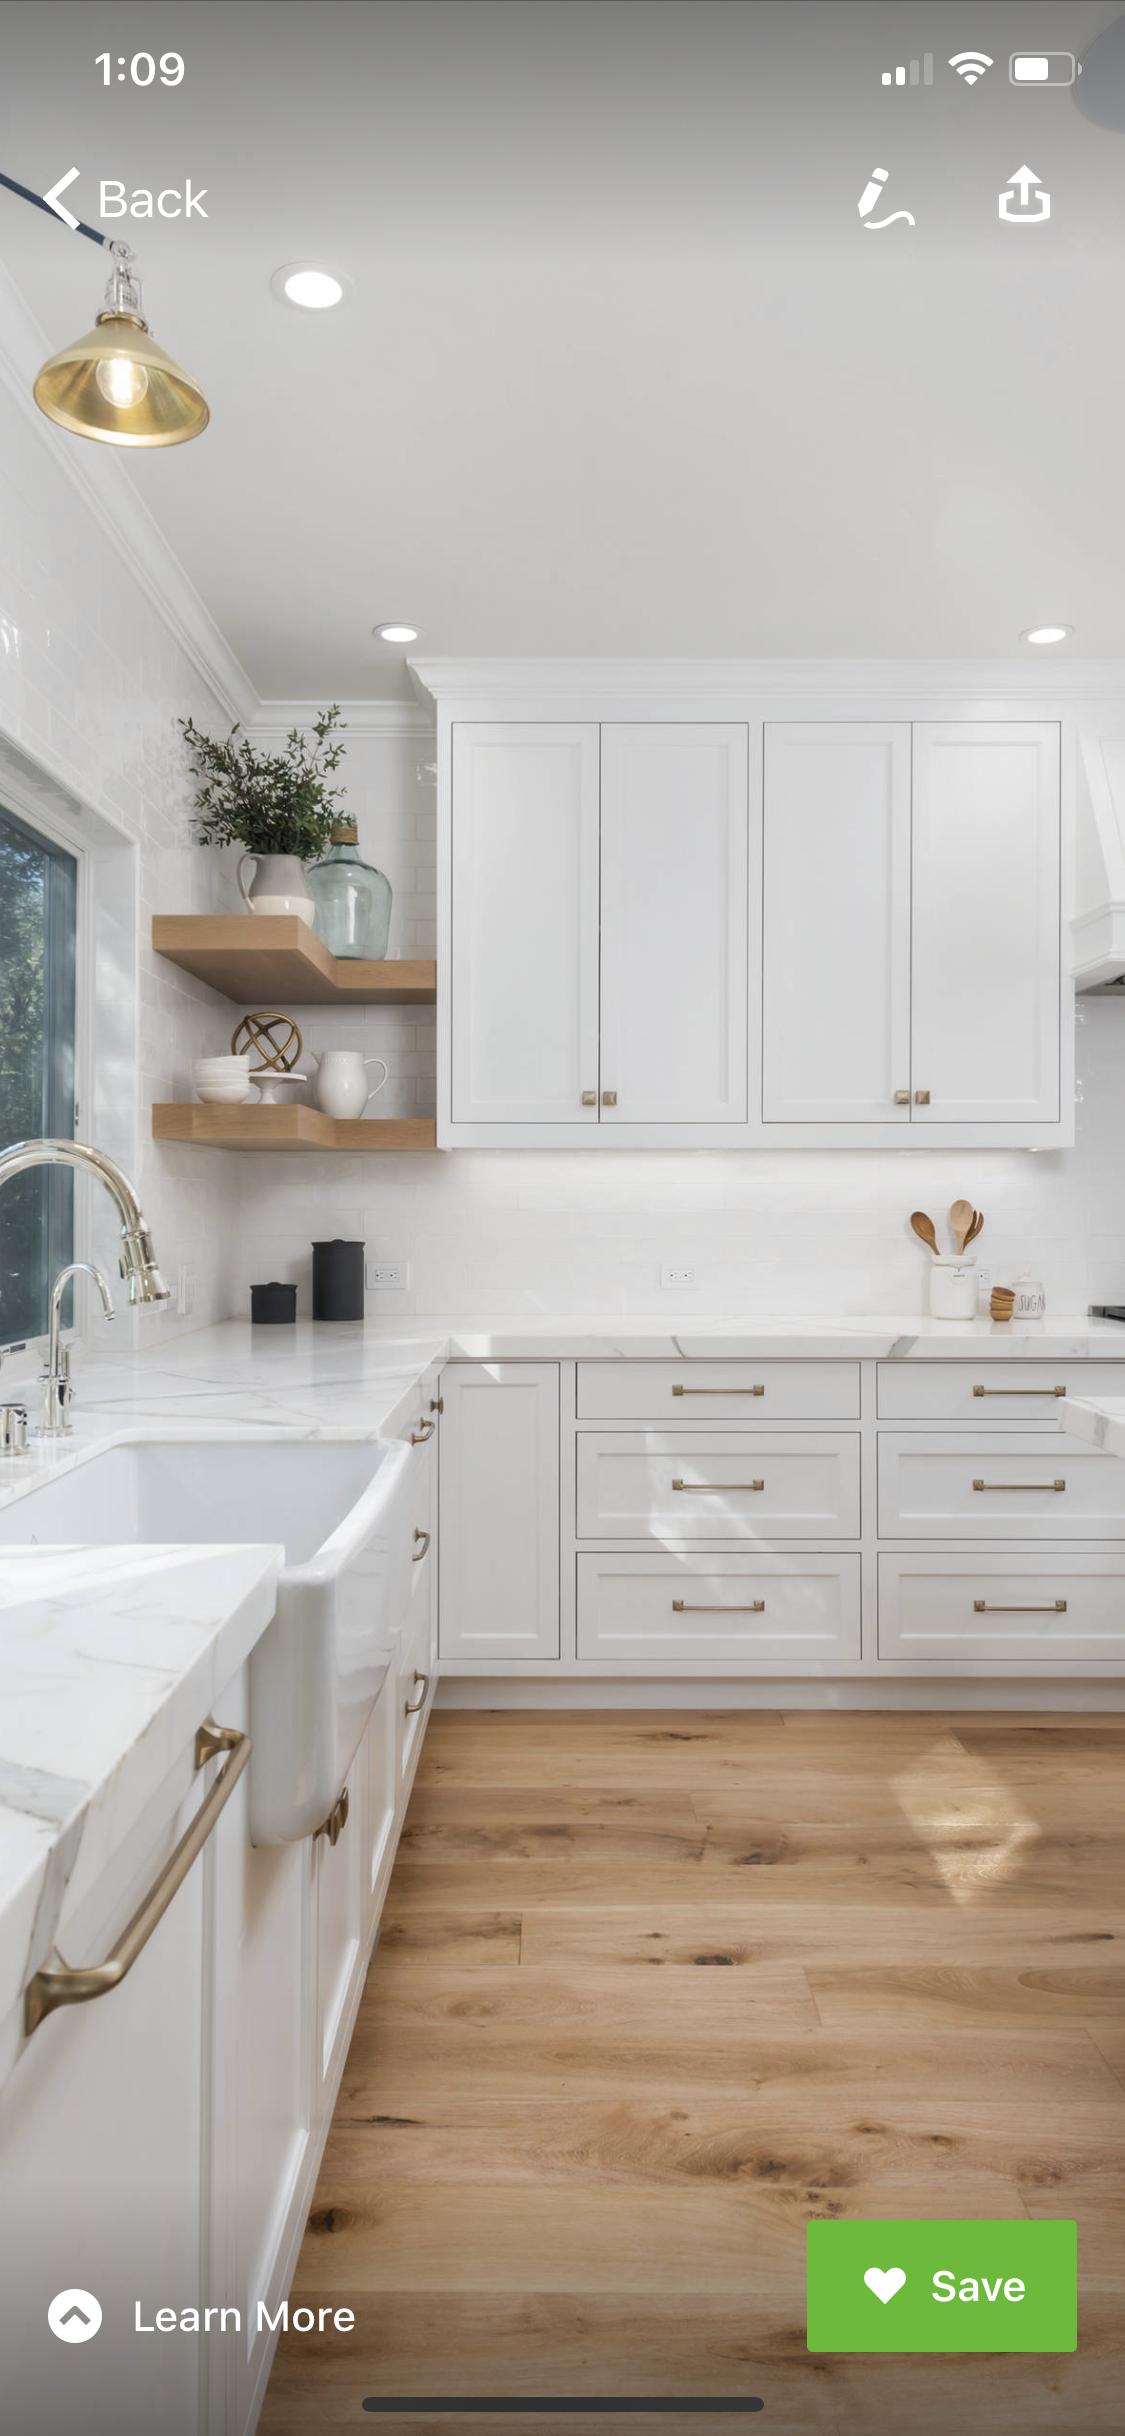 Pin By Lauren Doherty On Kitchen Reno In 2020 Kitchen Reno Home Decor Kitchen Cabinets